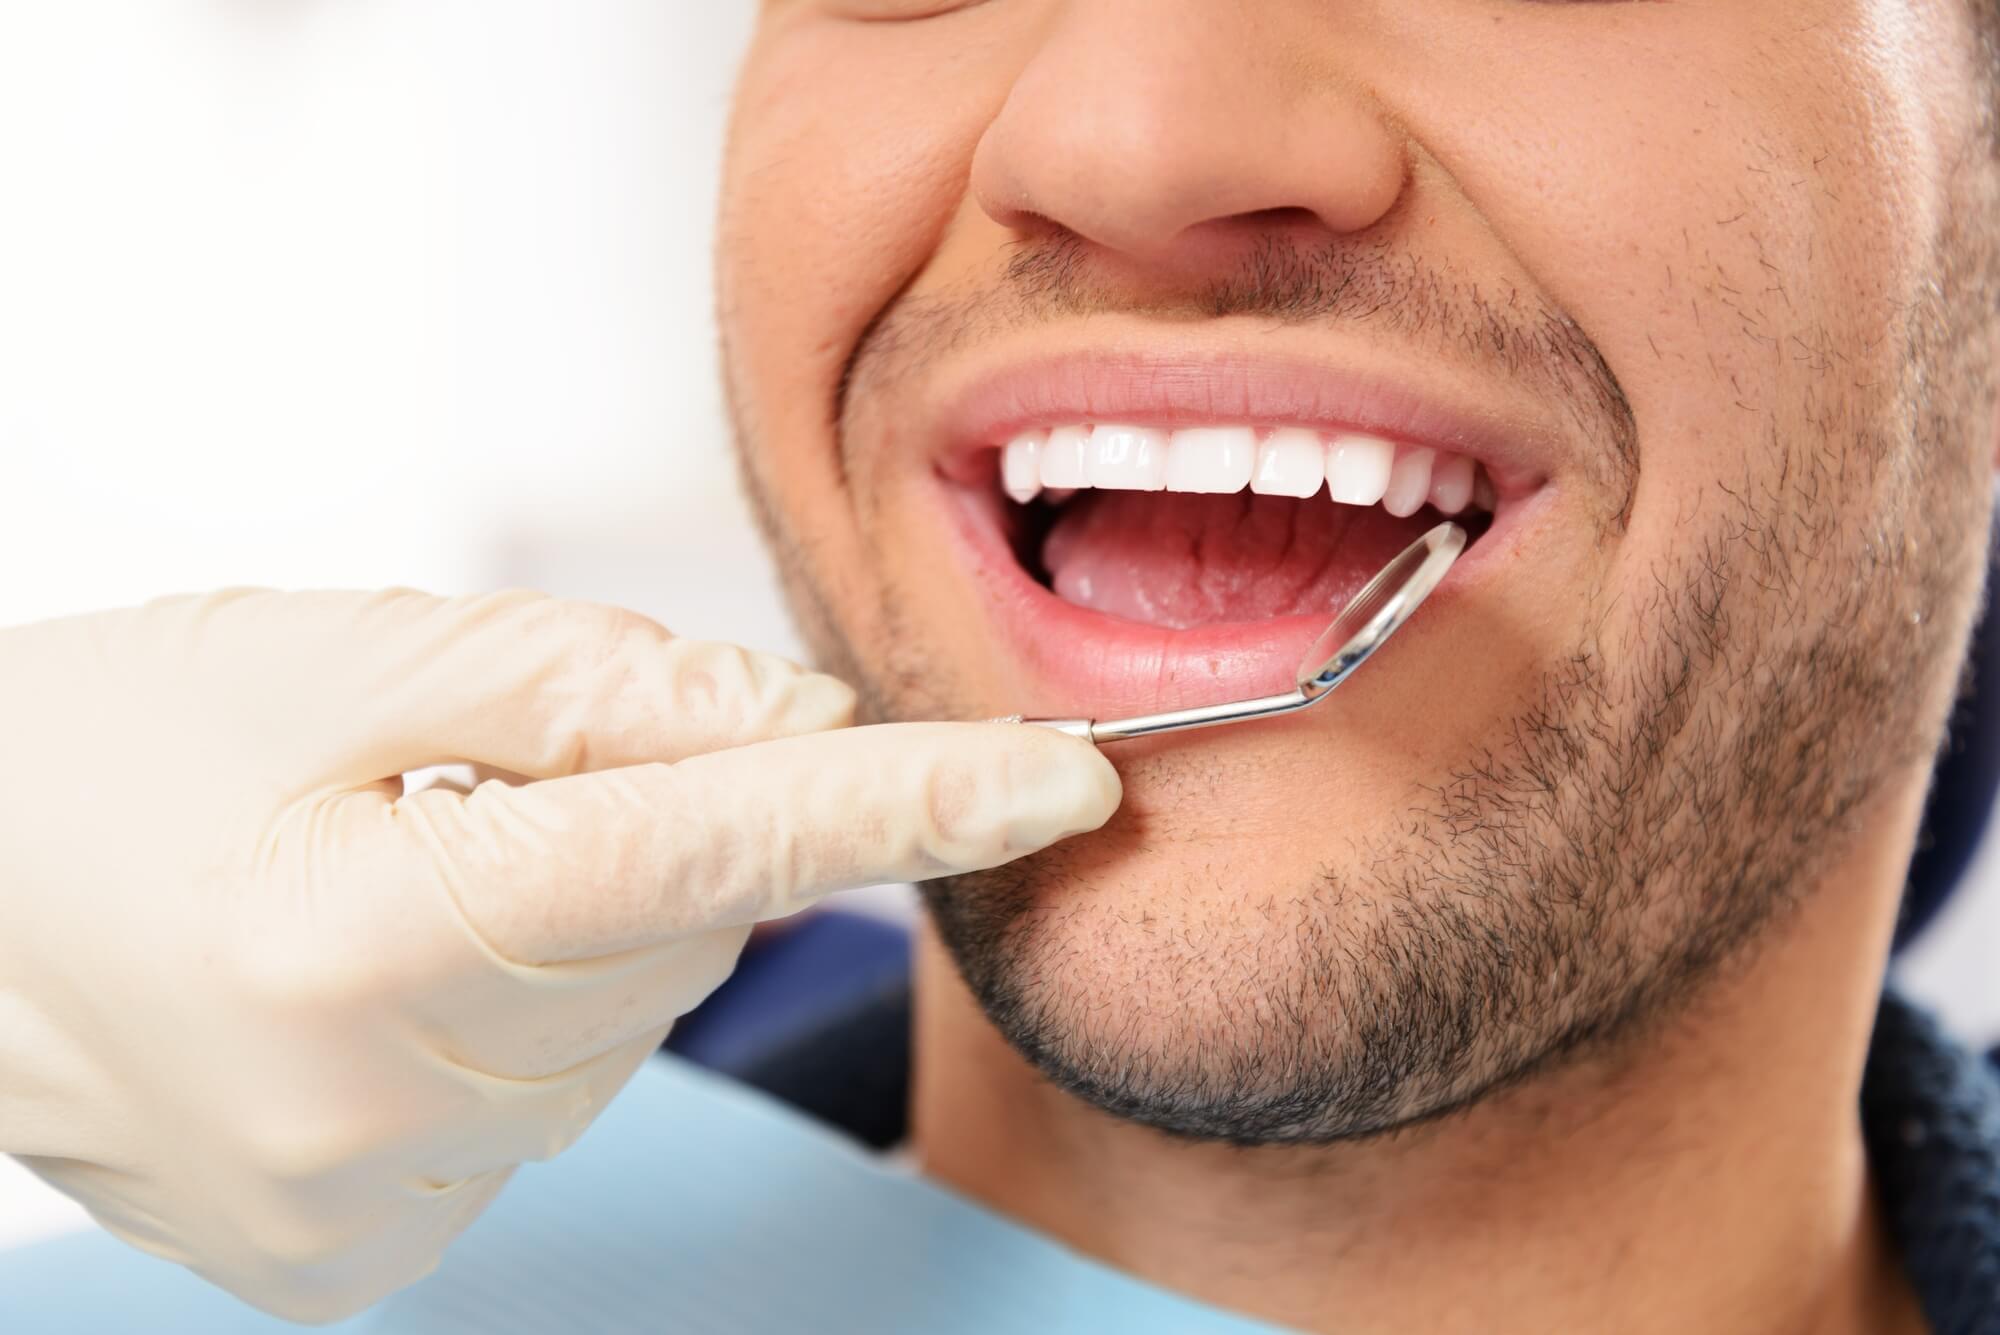 where can i get dental implants in oak park?